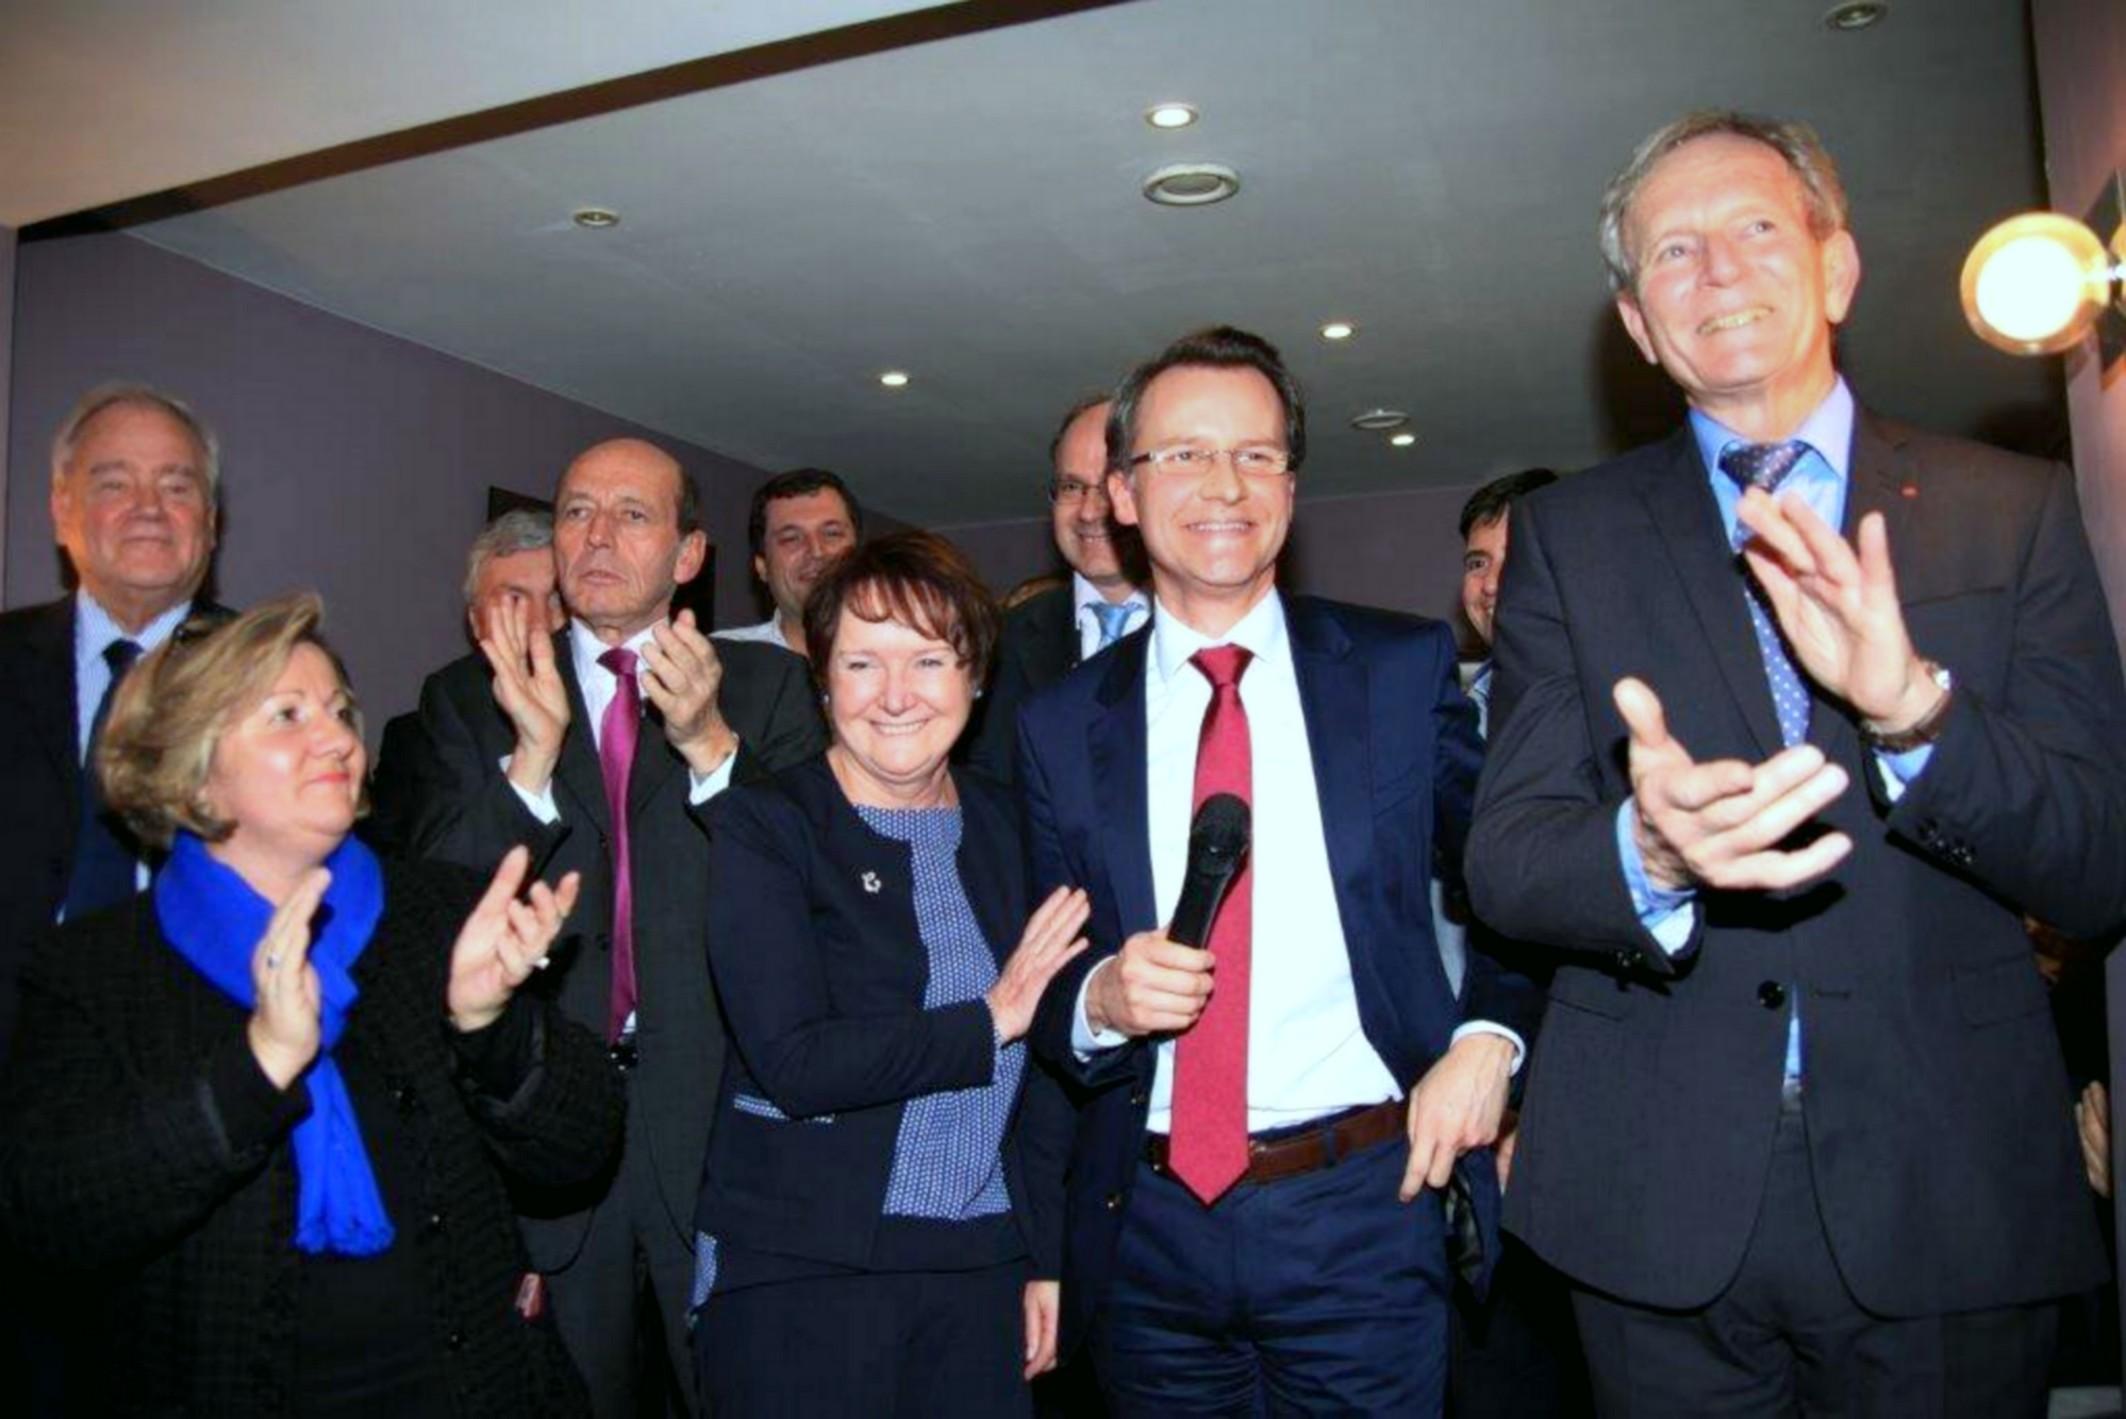 Hervé Gicquel et Chantal durand lancement de campagne charenton saint-maurice